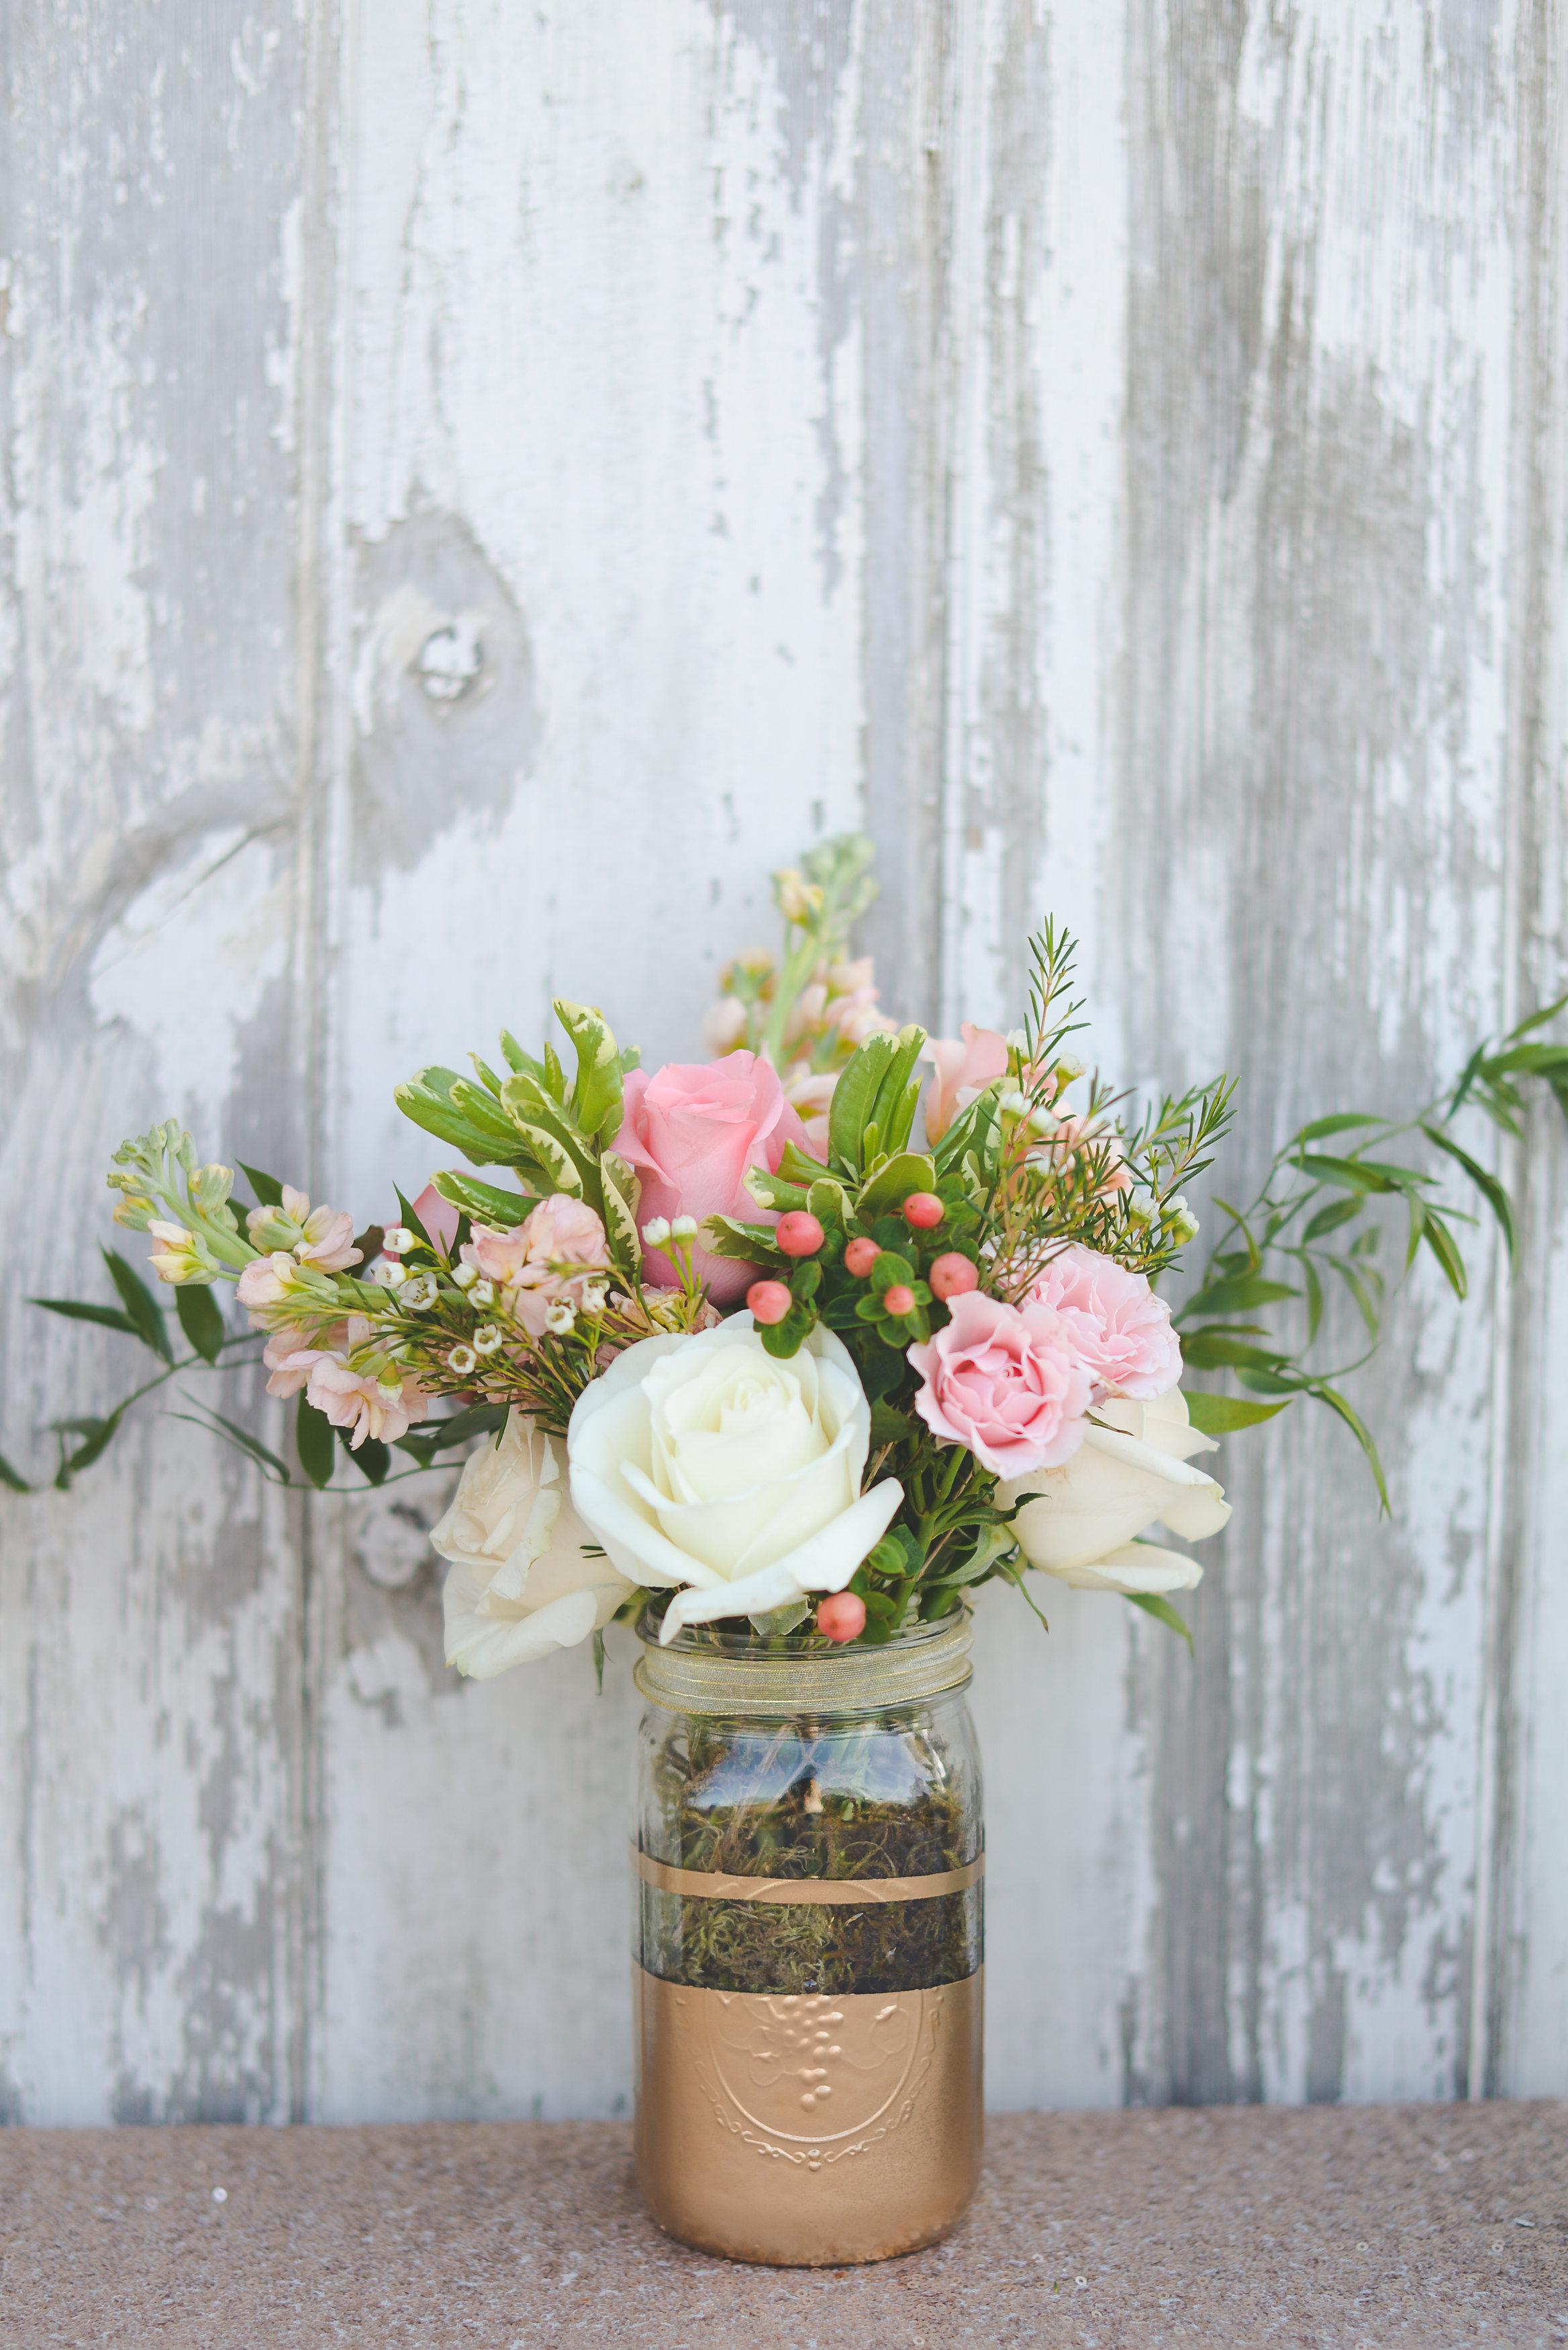 Elegant Rustic Wedding Flower Centerpieces – Wedding